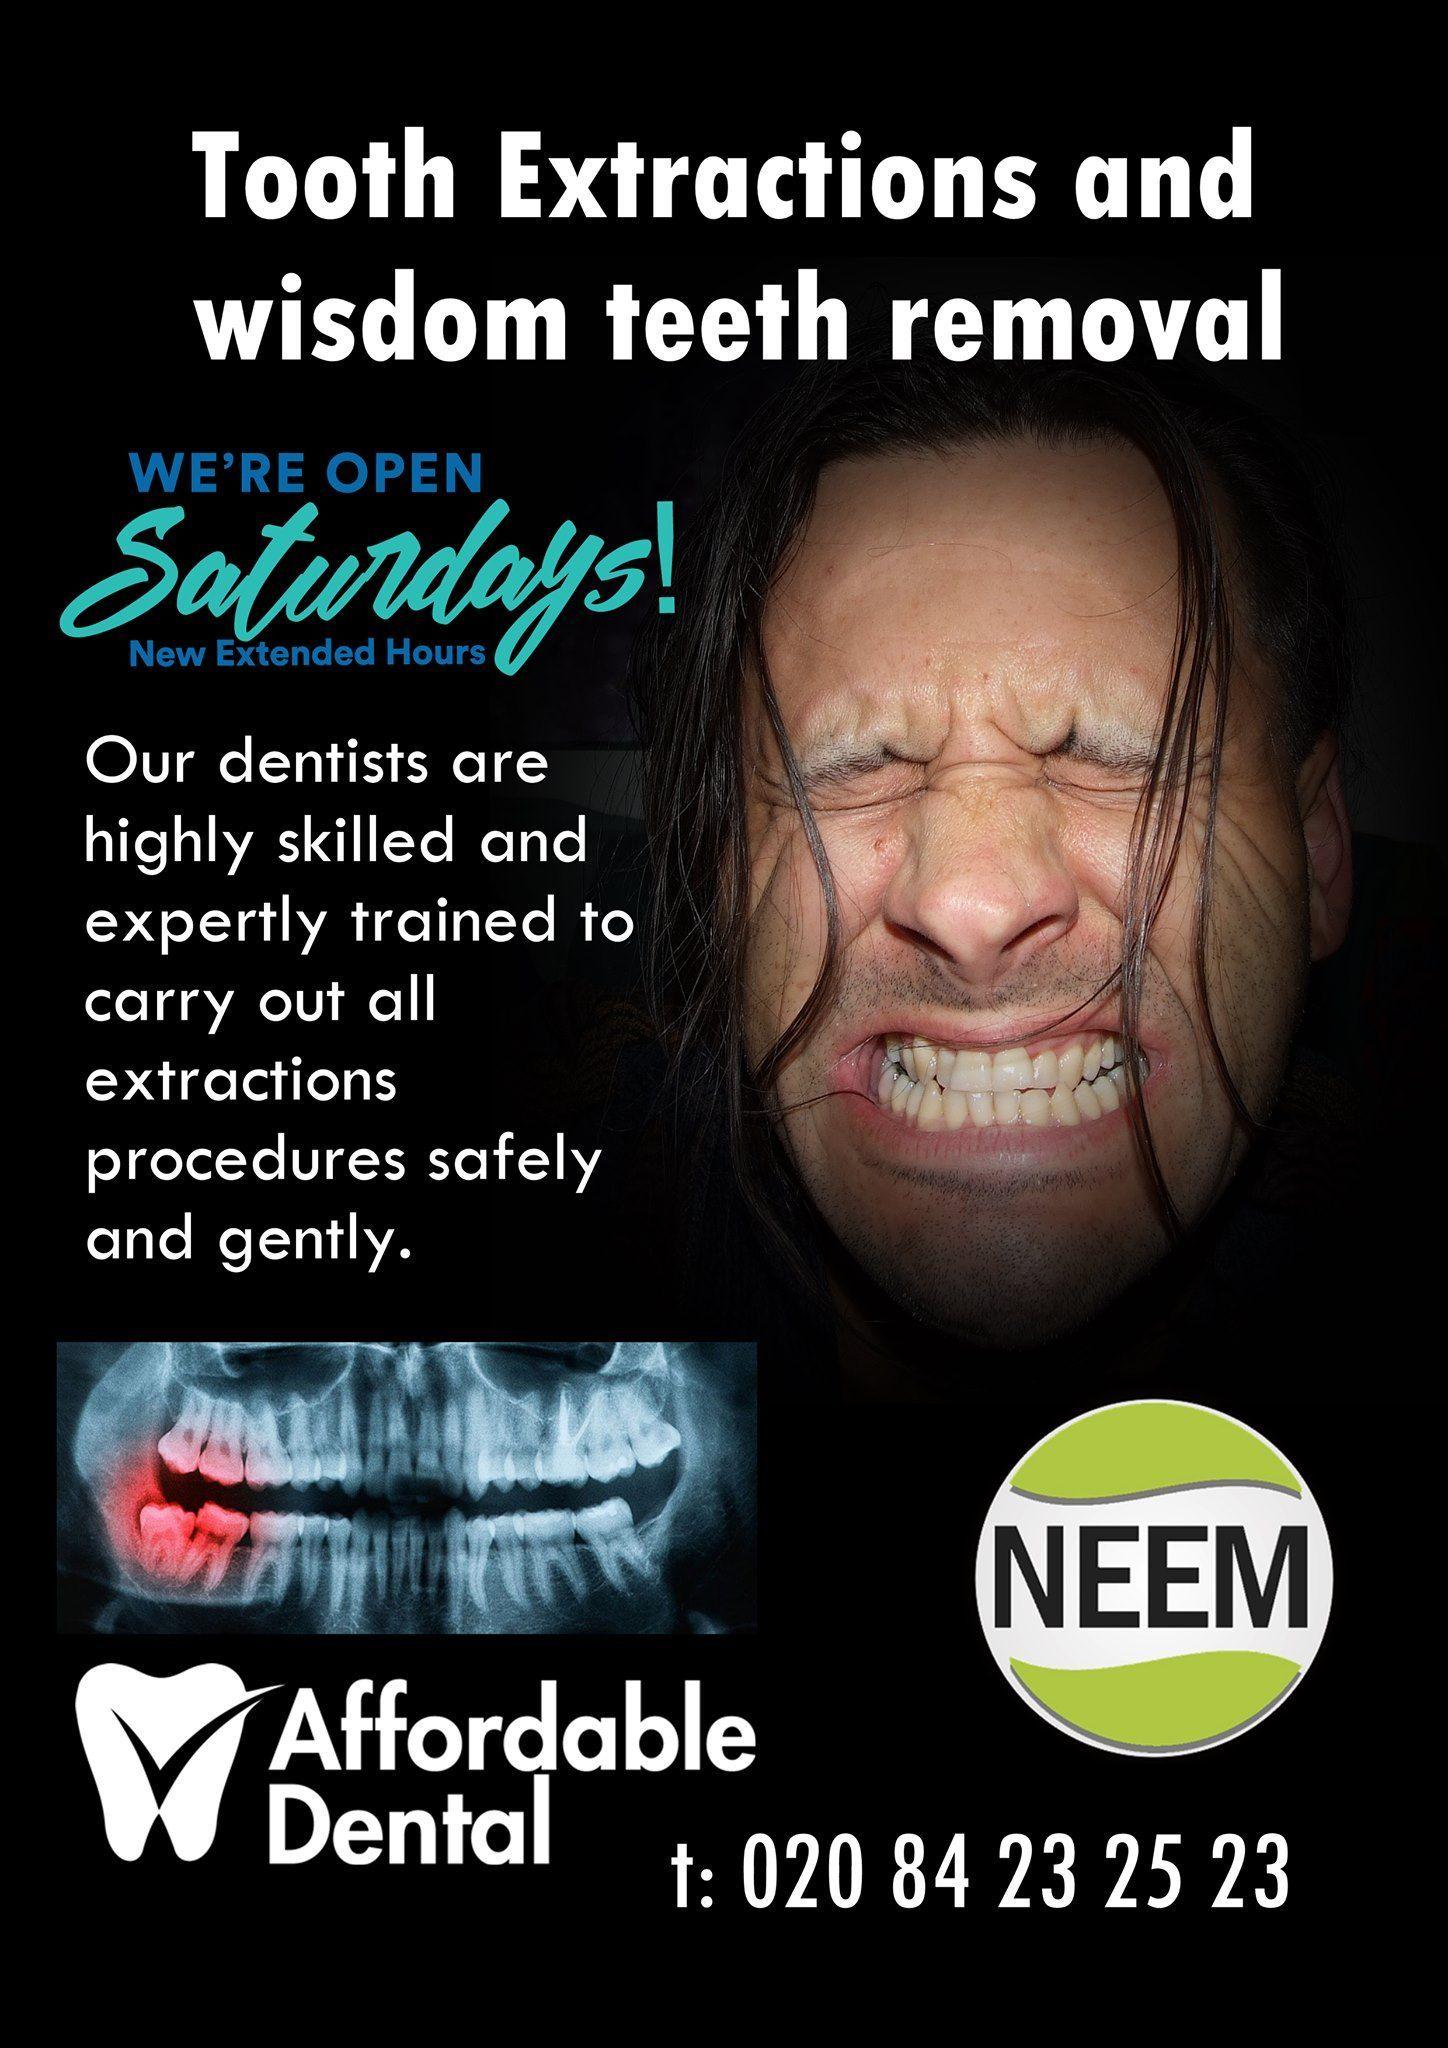 Womanly Tooth Extraction Healing Baking Soda Teethwhiteningtips Toothextractionaftercarefood Wisdom Teeth Removal Wisdom Teeth Tooth Extraction